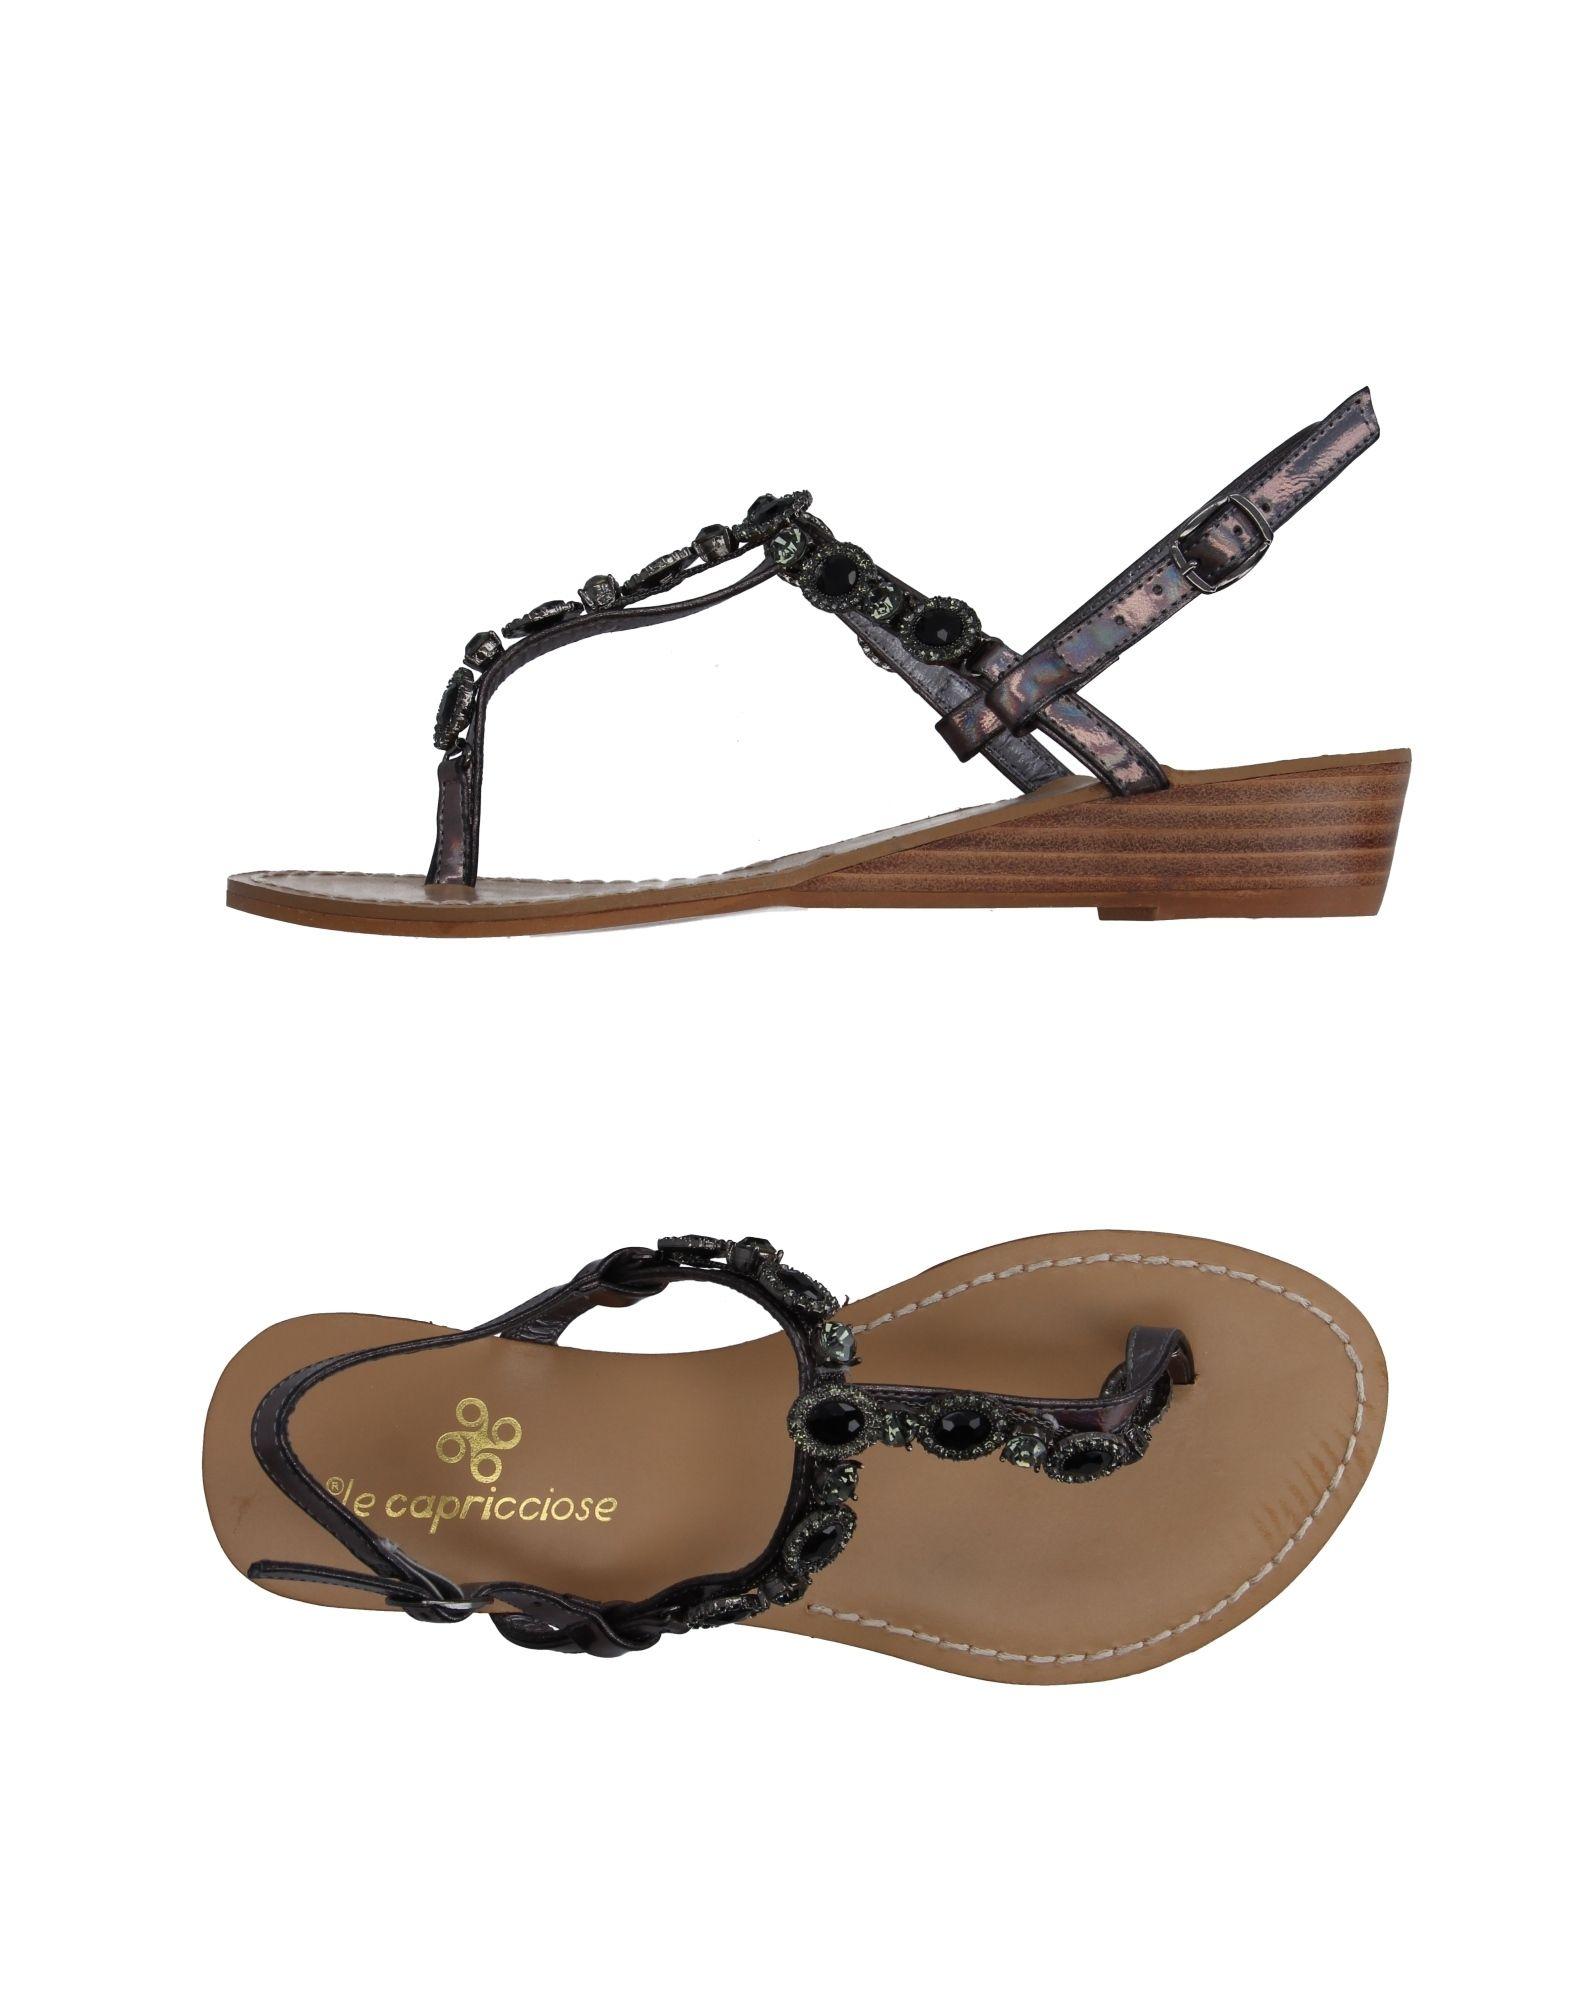 Le Capricciose® Dianetten Damen  11176693AF Gute Qualität beliebte Schuhe